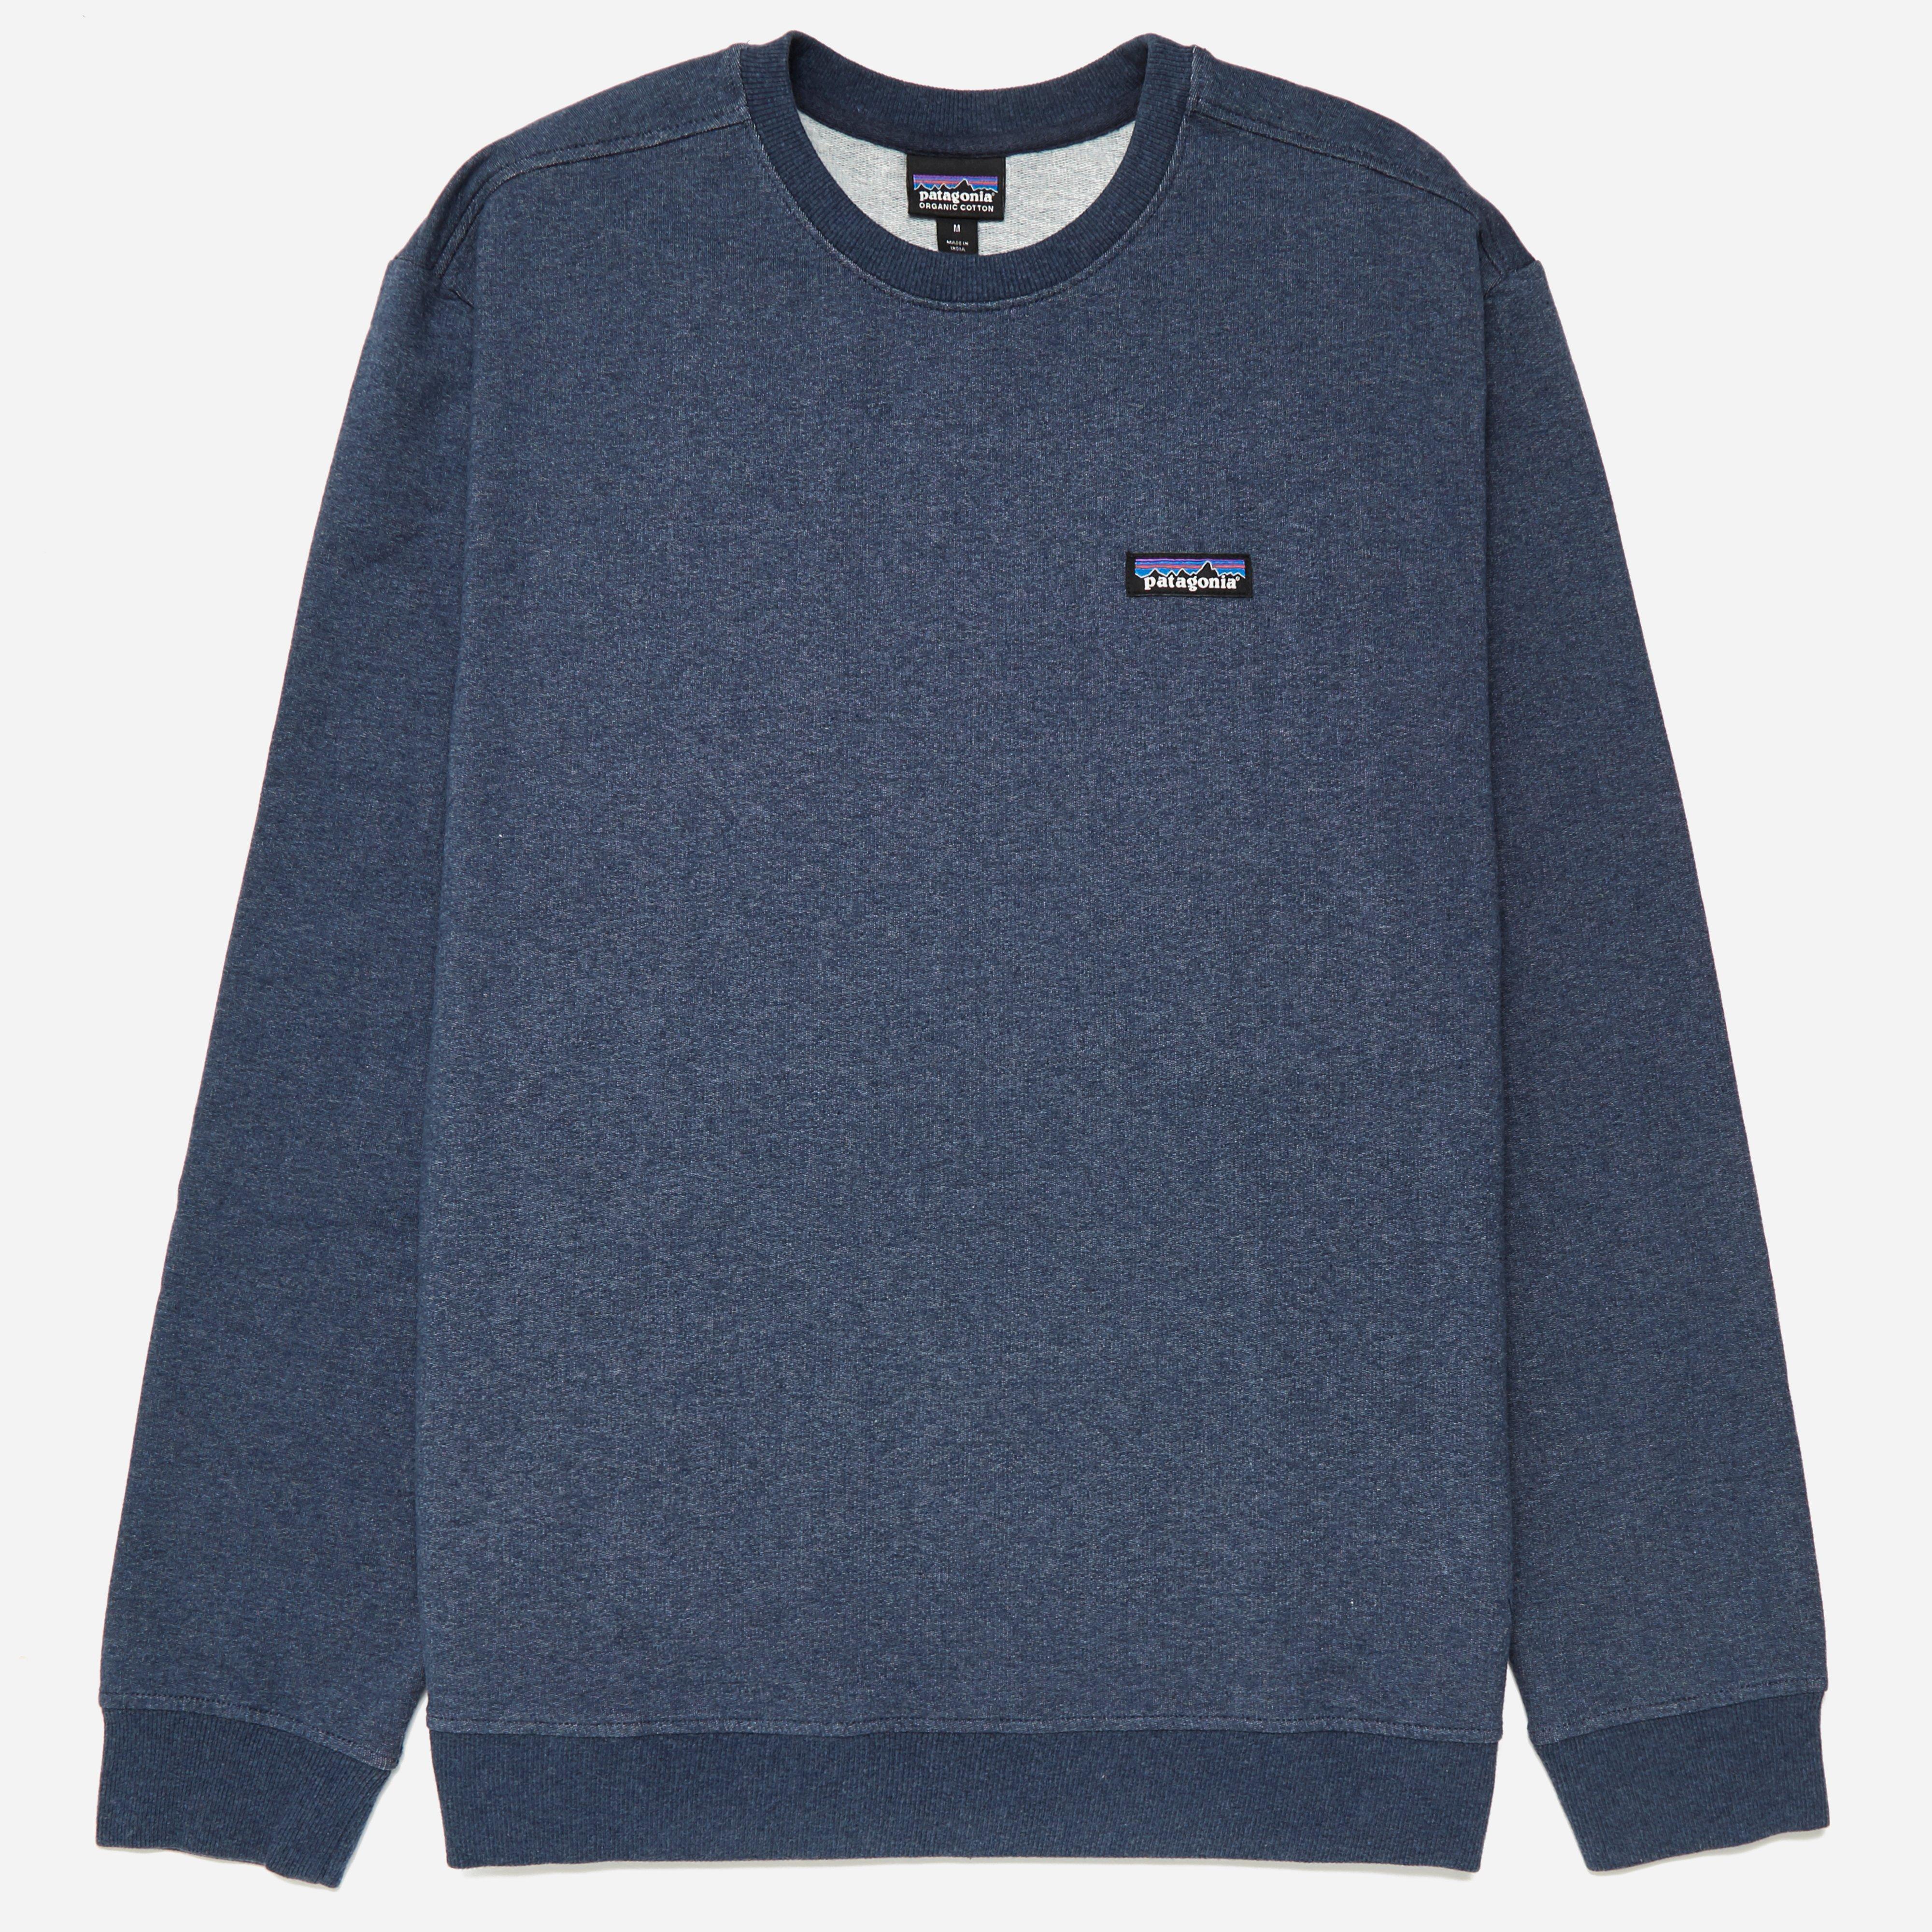 Patagonia P-6 Label MW Crew Sweatshirt